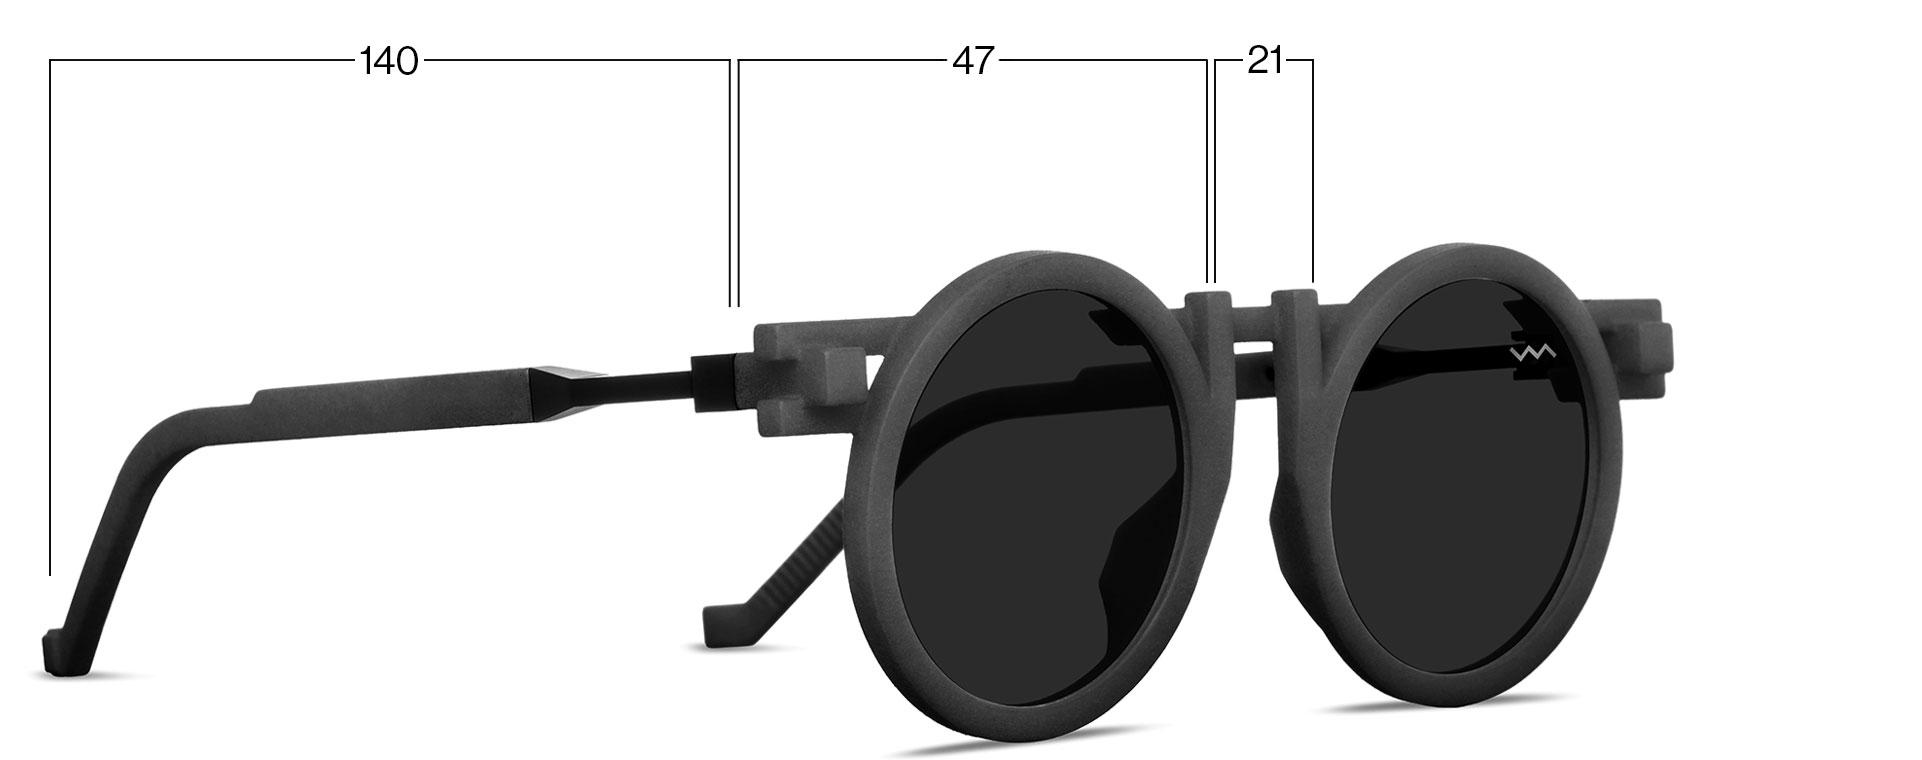 VAVA CL0013 kengo kuma black sunglasses online shop sizing